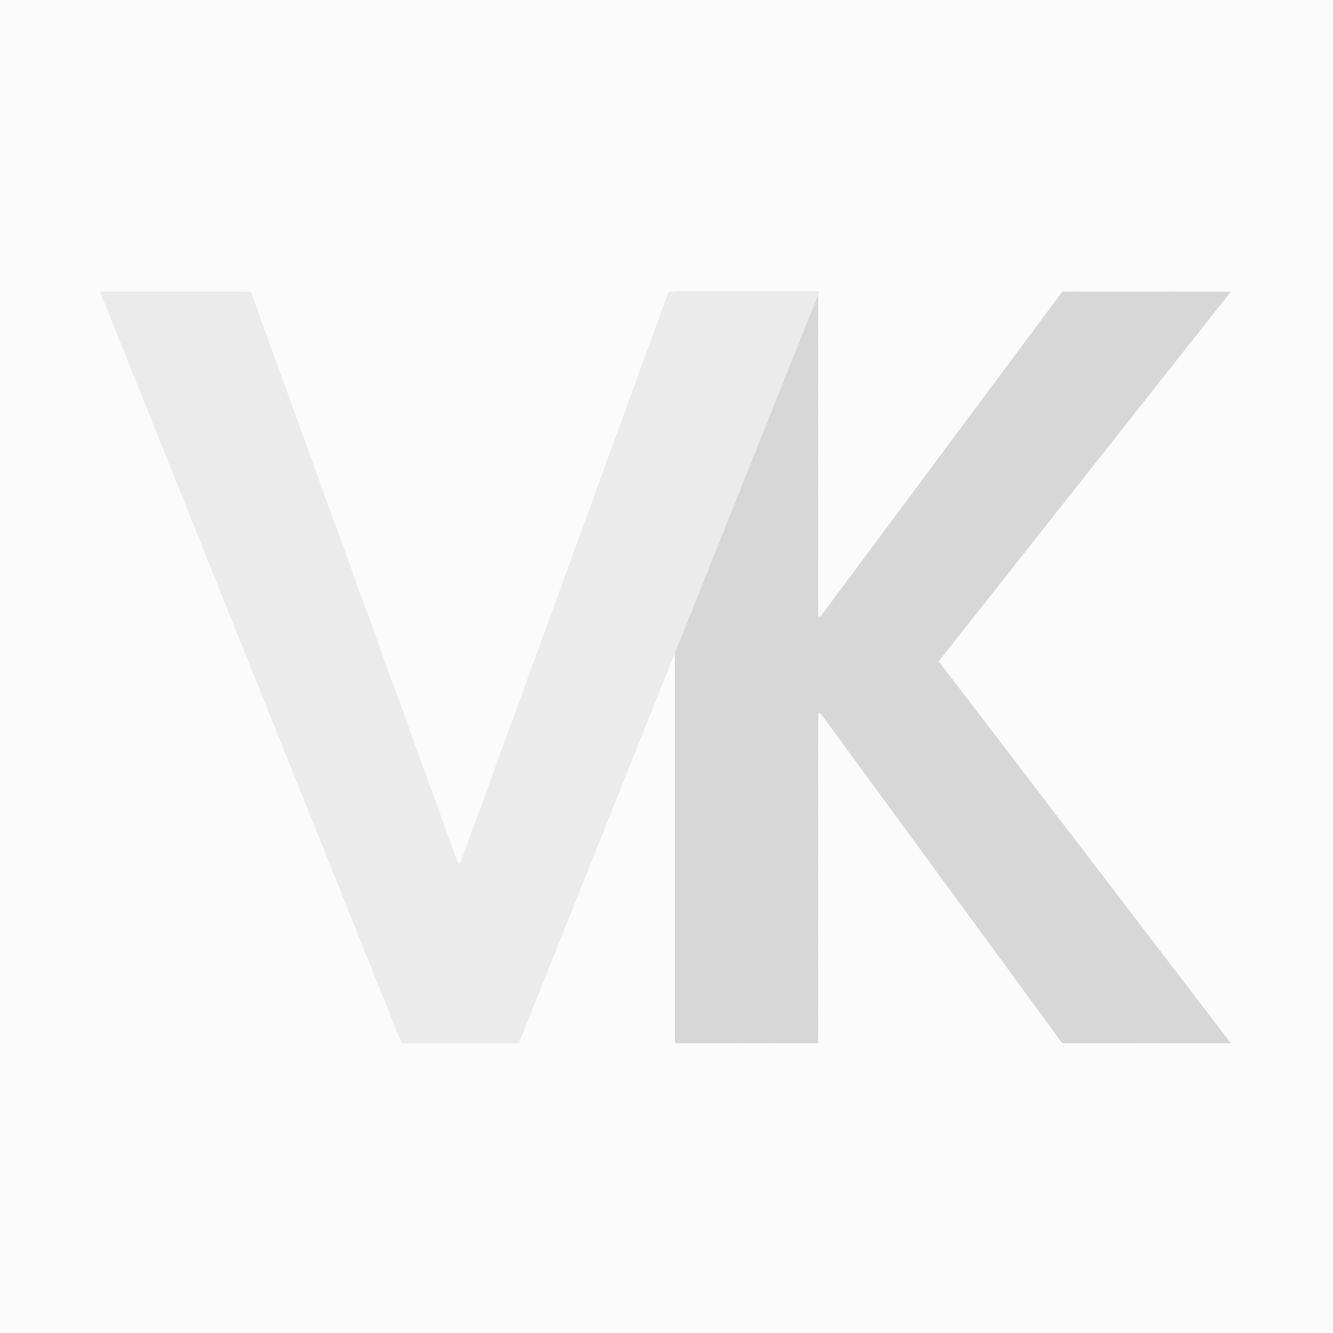 Kyone 800 Slice Kappersschaar 6.5